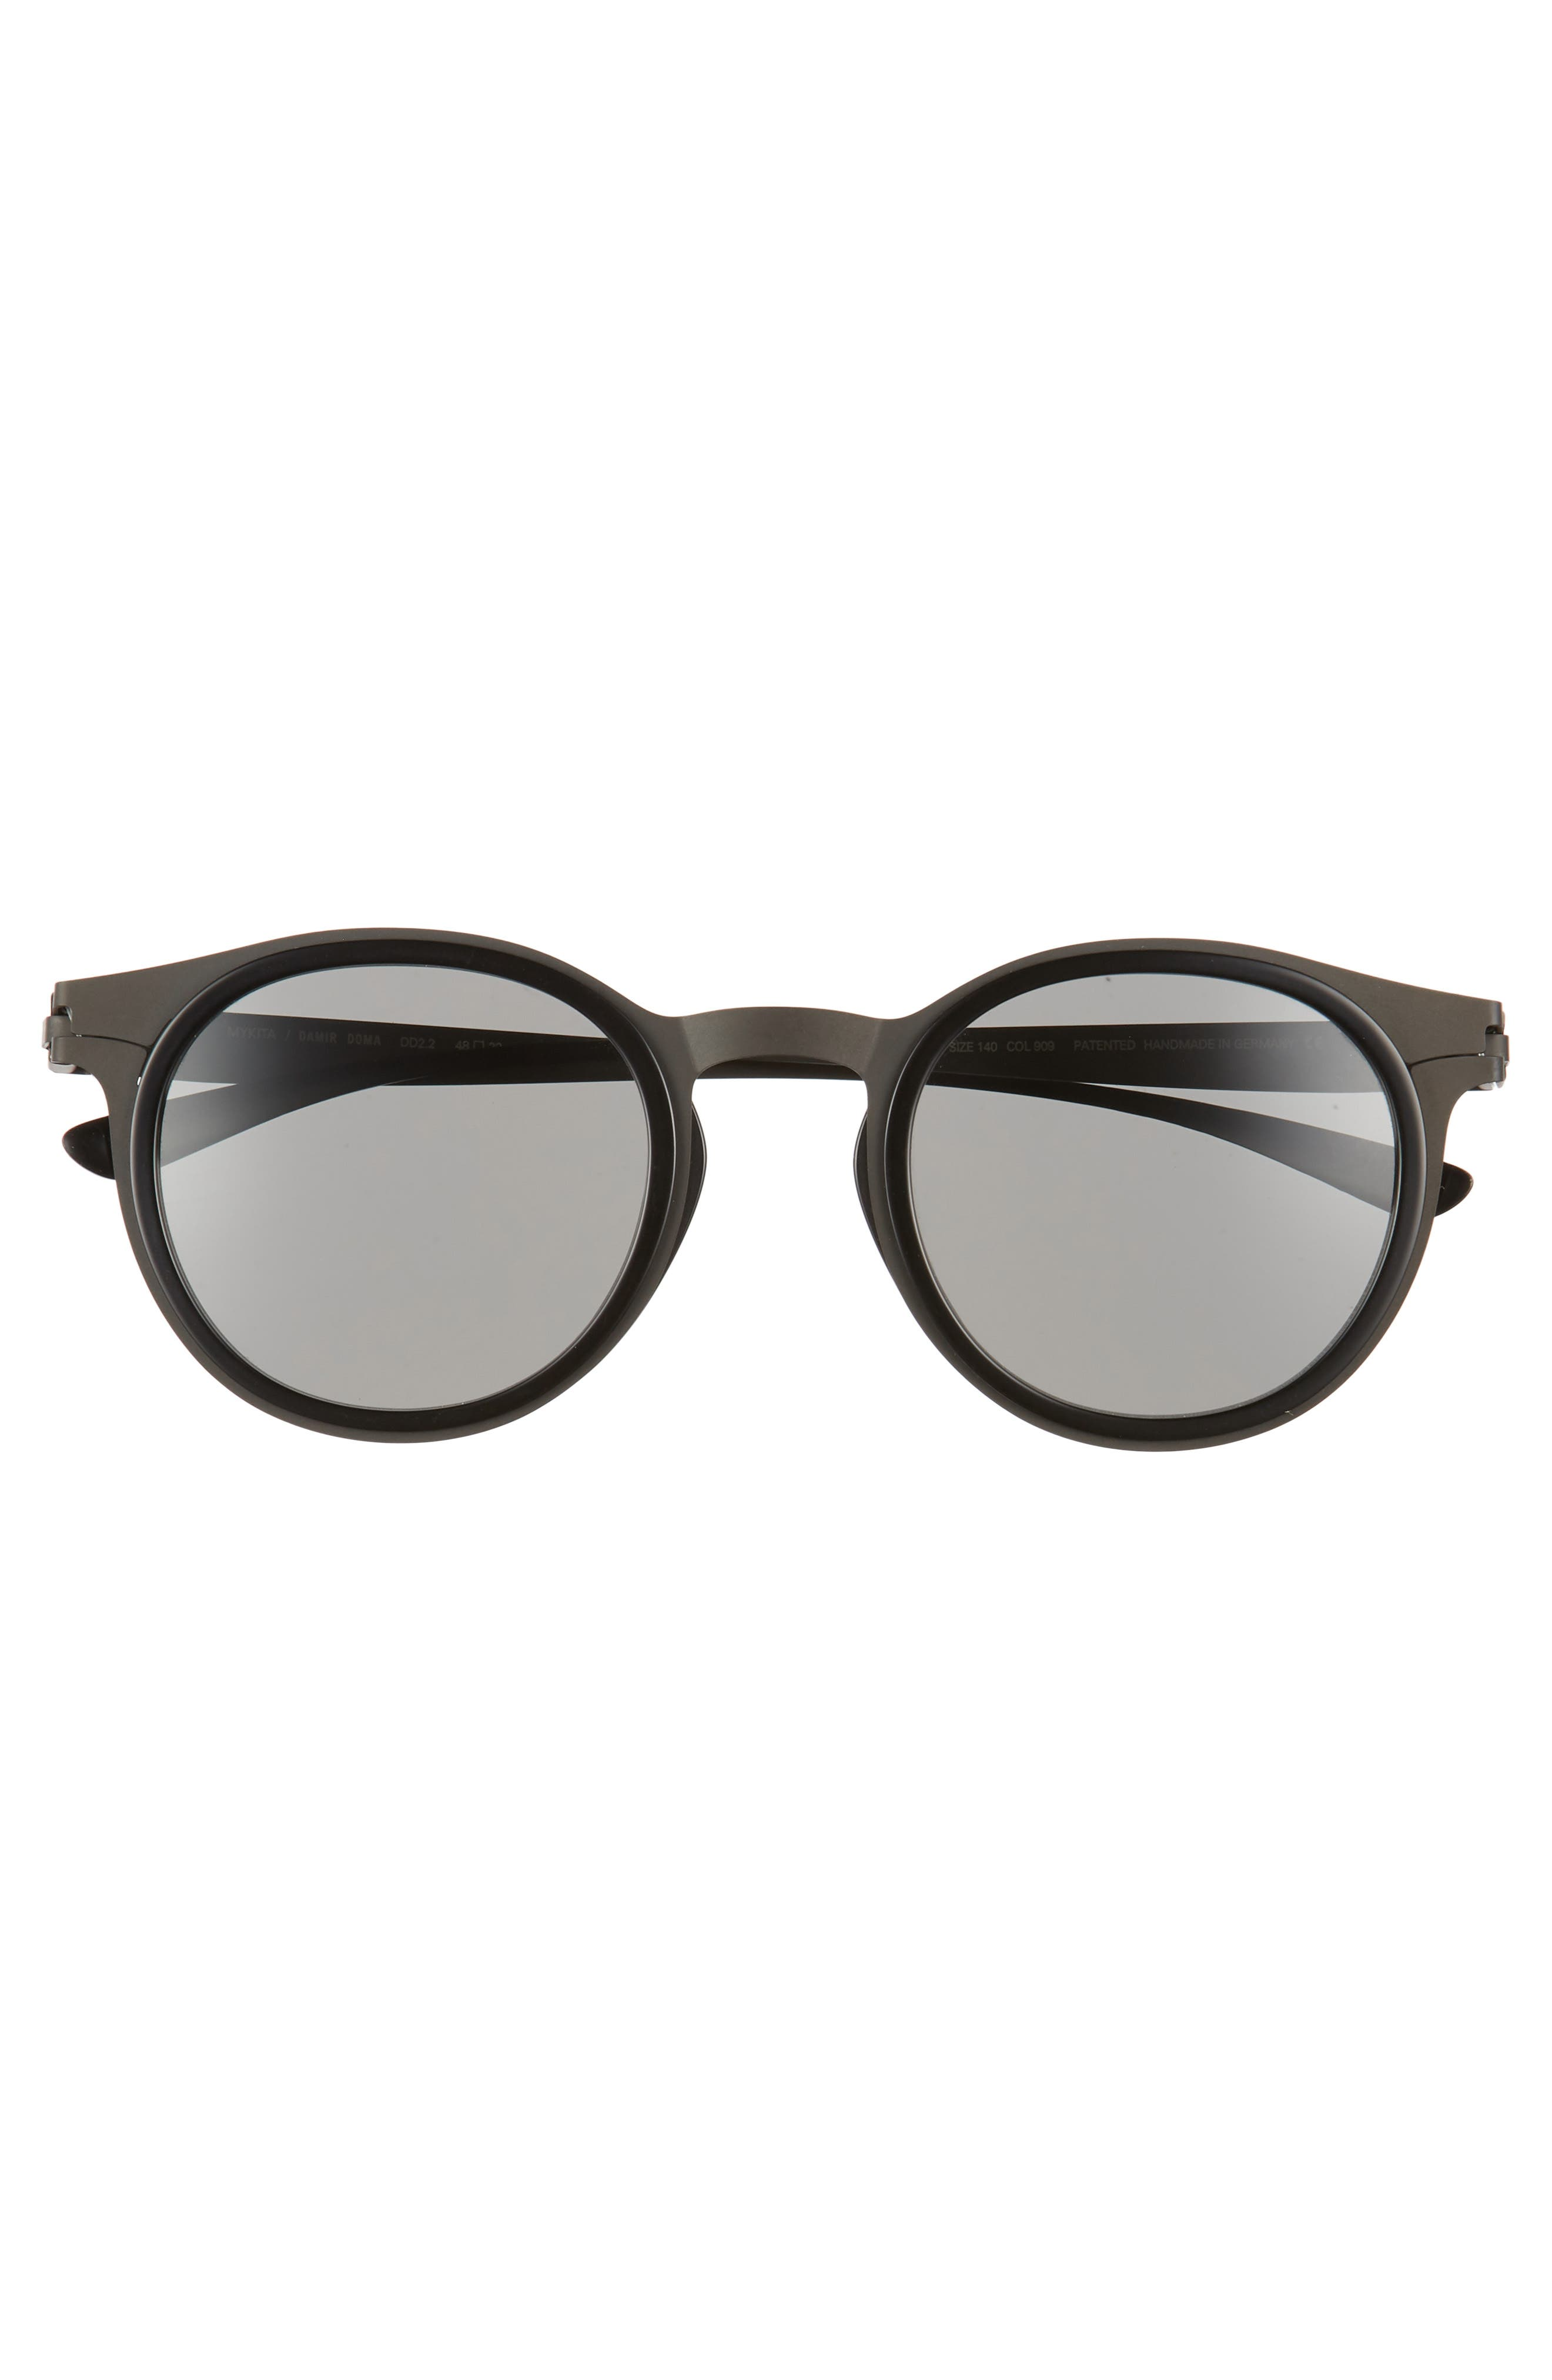 DD2.2 48mm Round Sunglasses,                             Alternate thumbnail 2, color,                             001